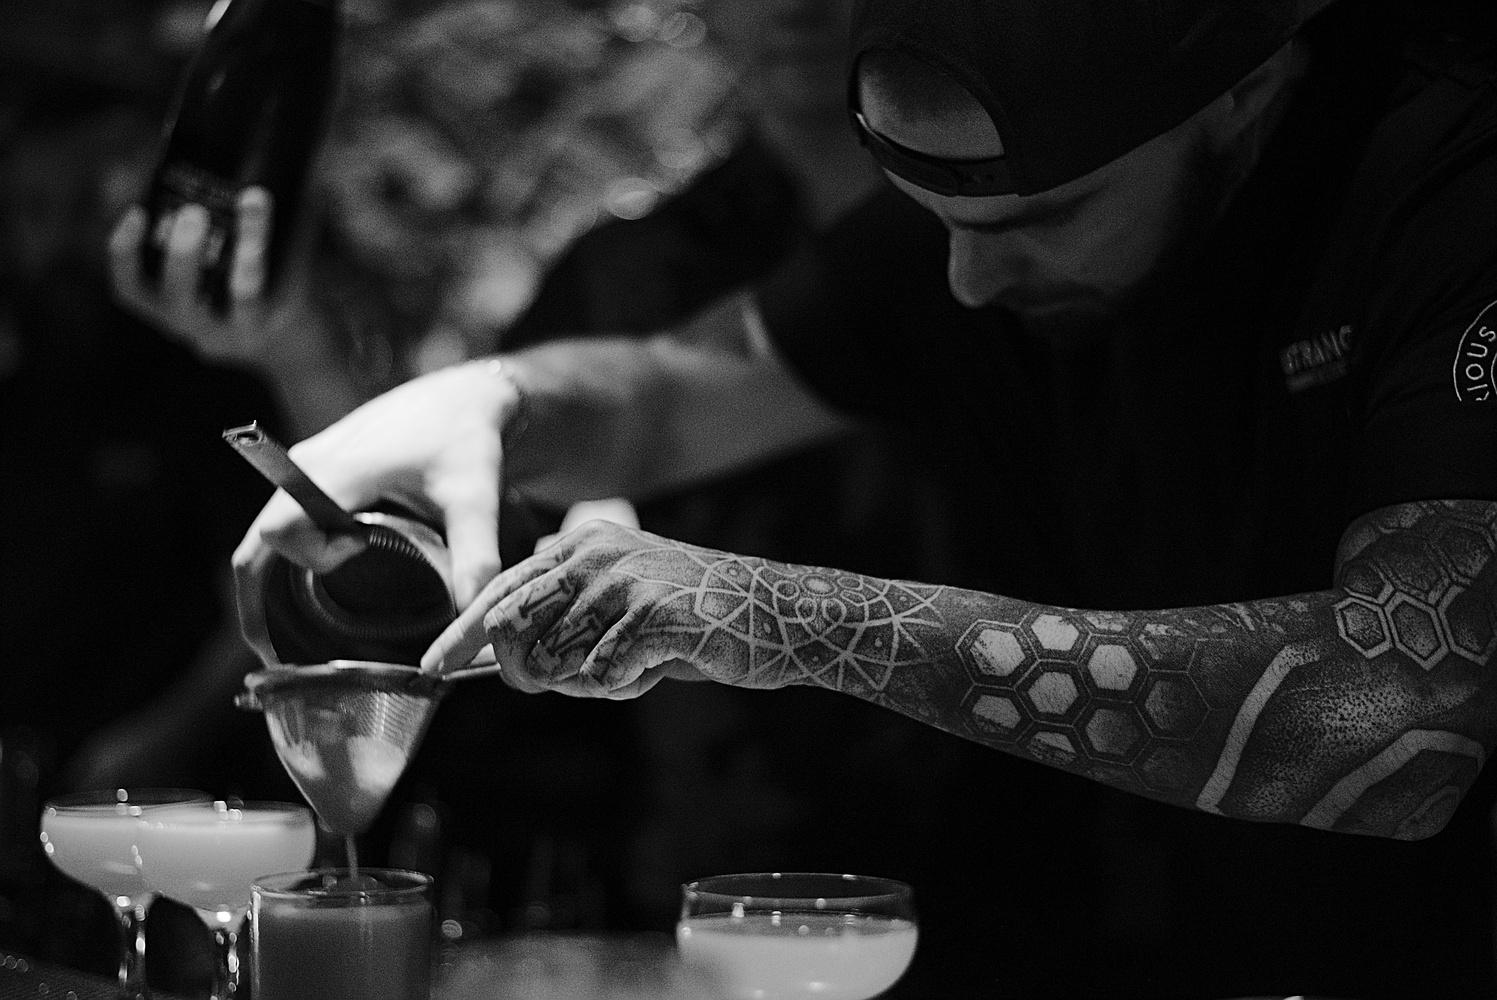 Bartender at Stranger in Gothenburg by Jeena Paradies